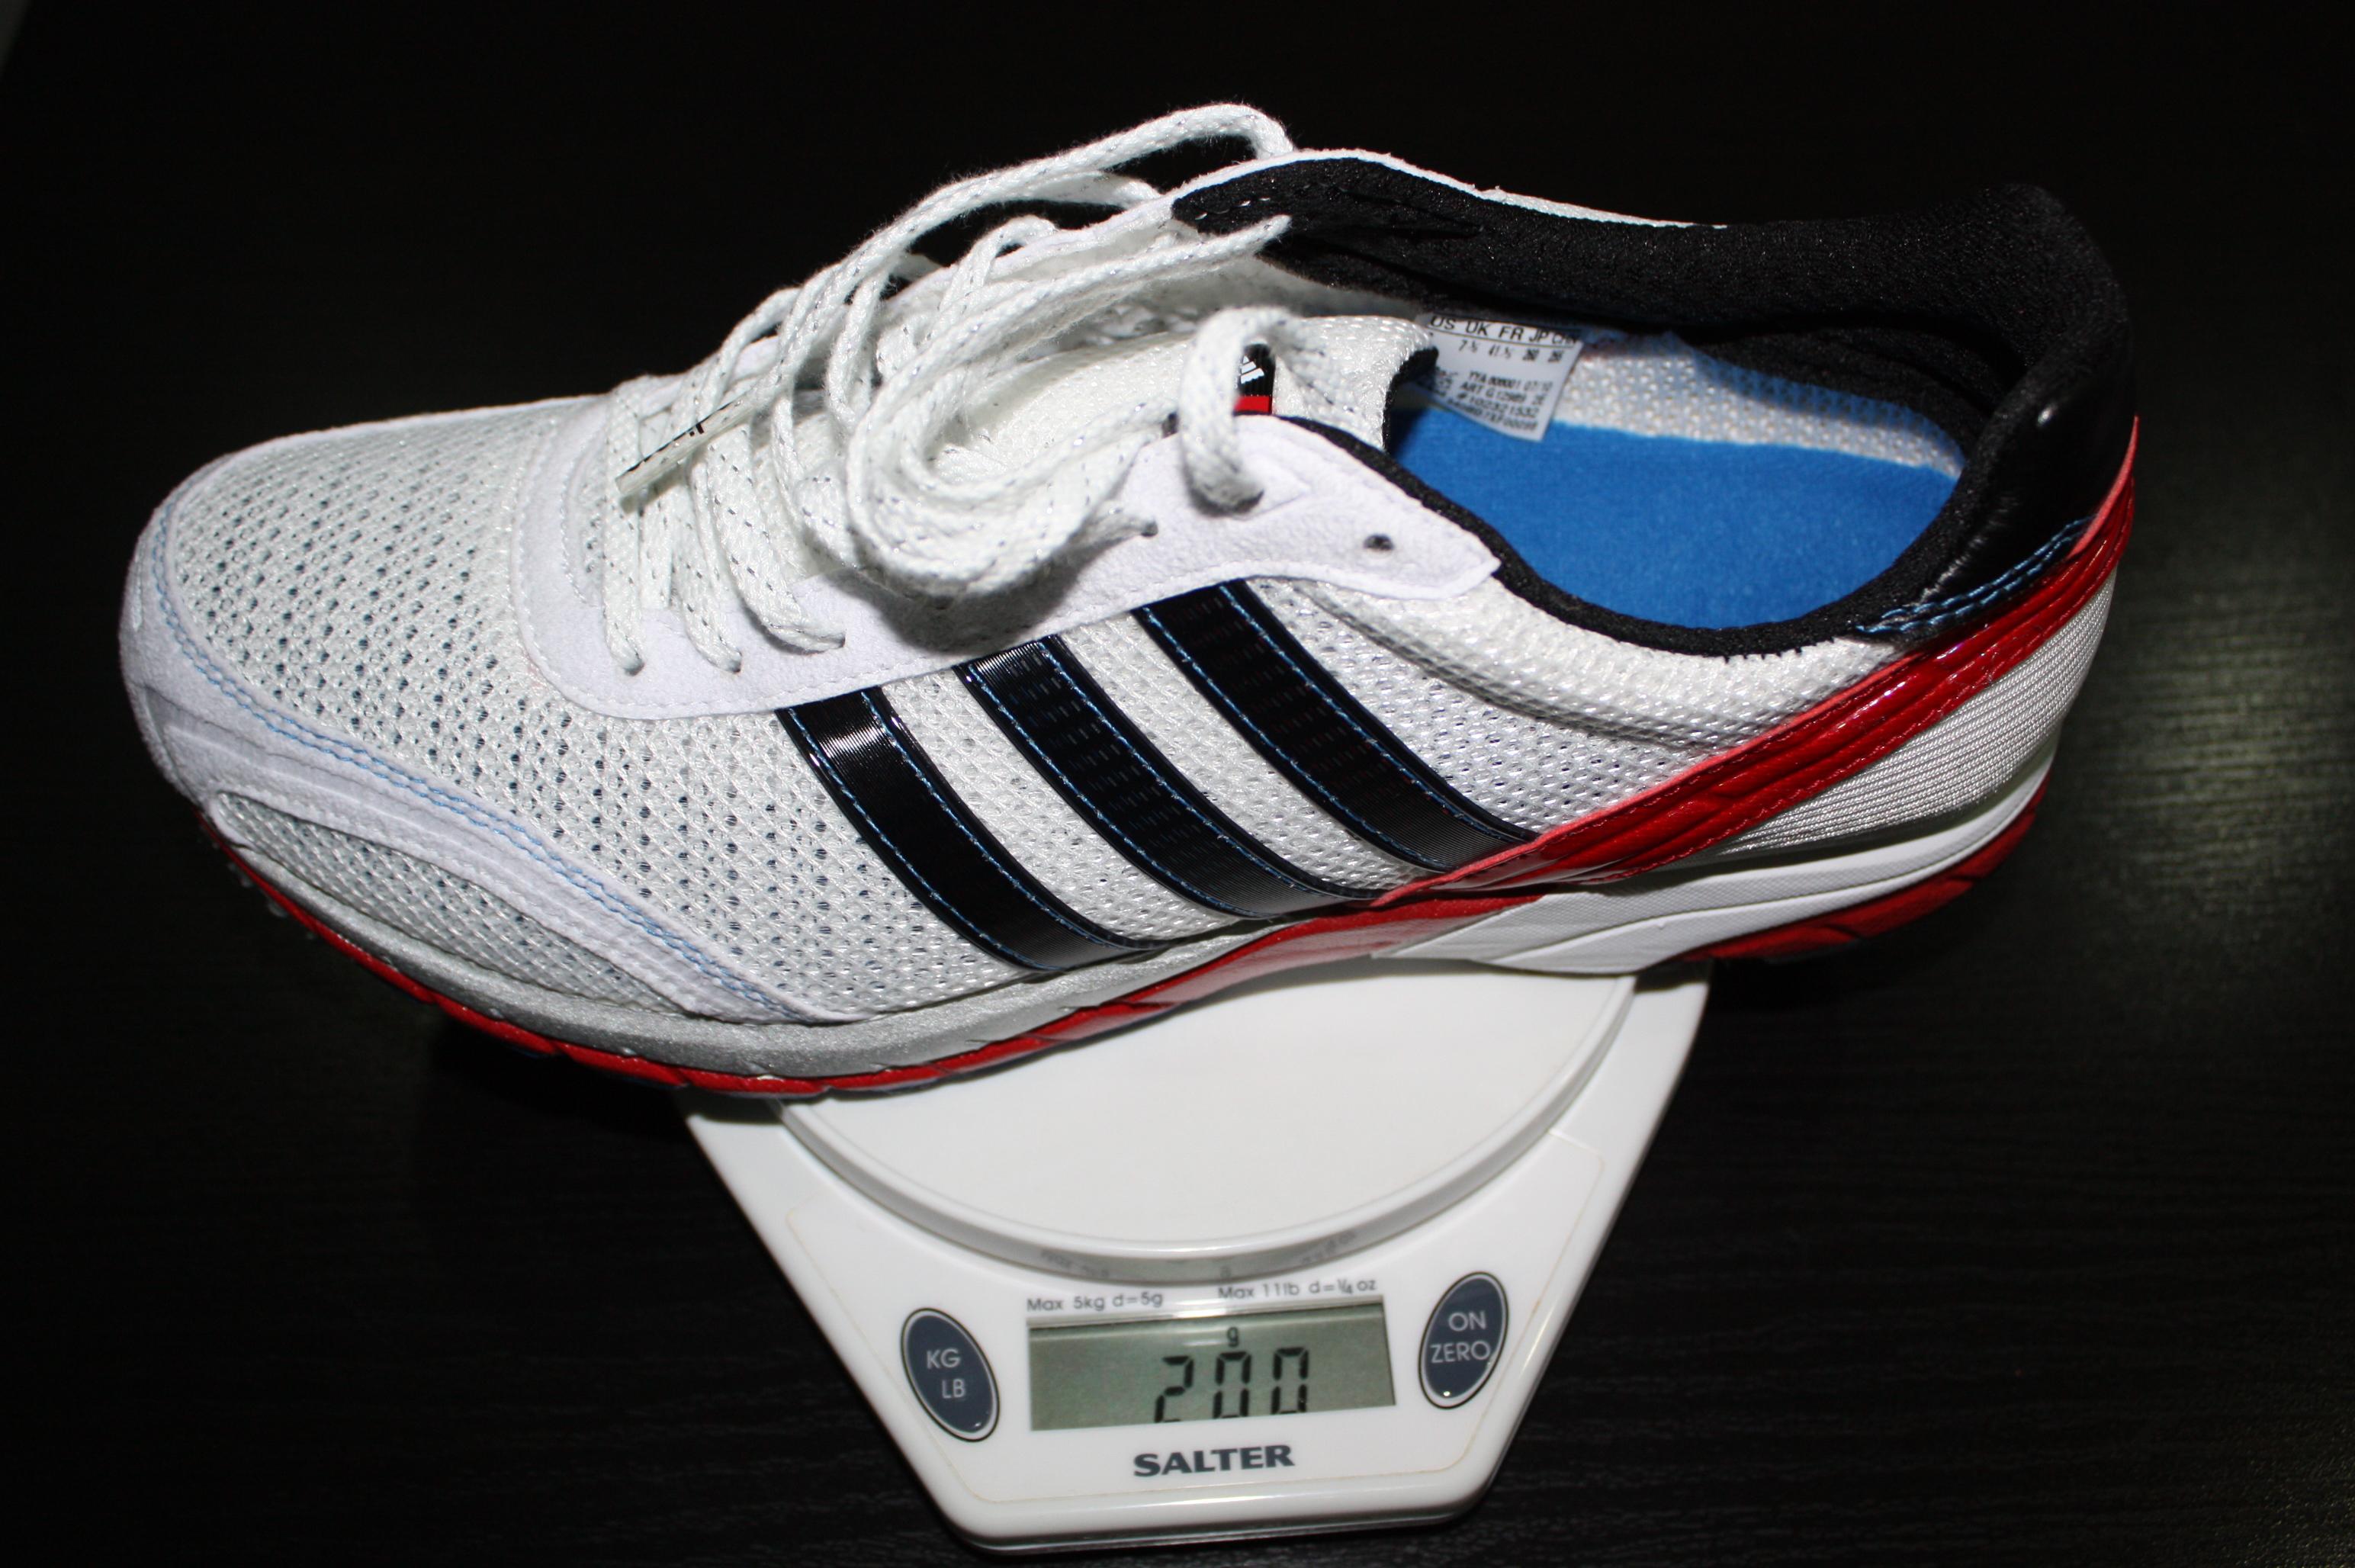 wholesale dealer 307c2 b4c64 One of the lightest Adidas ...